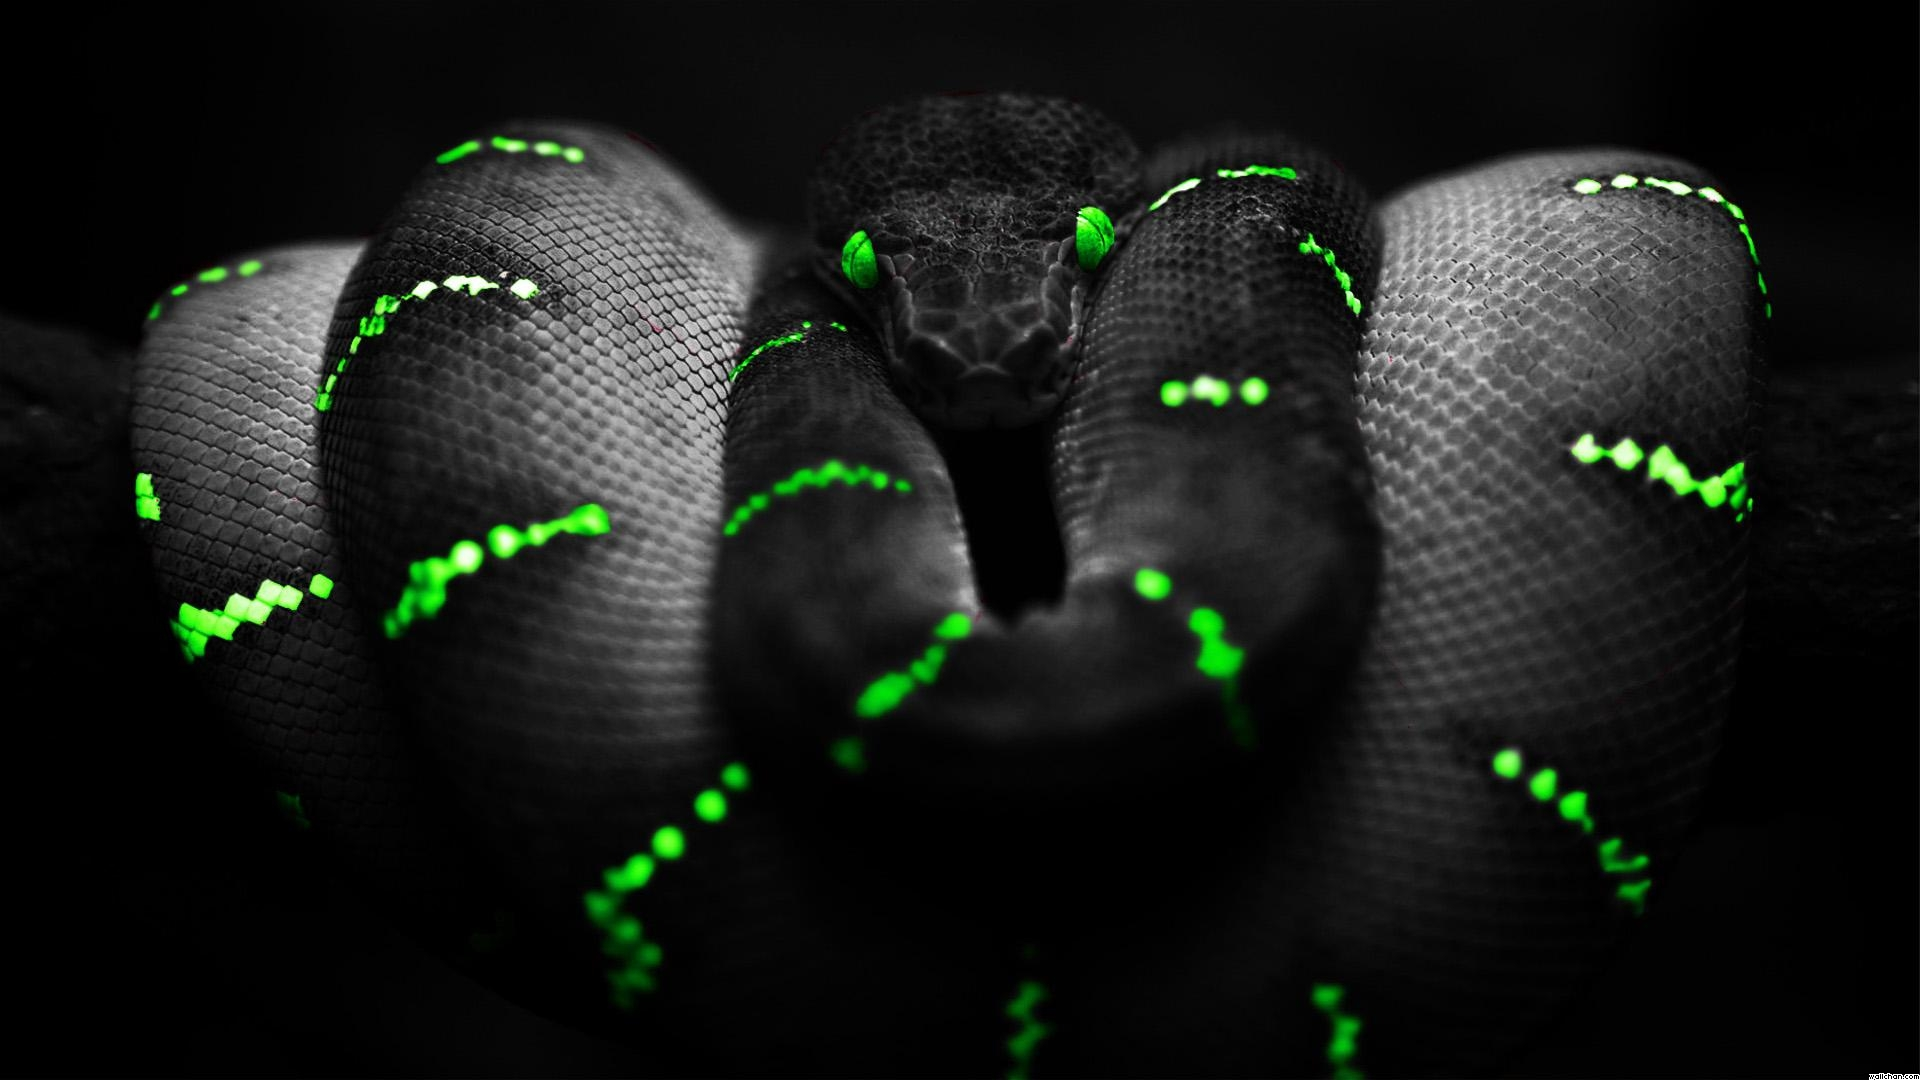 snake Black background